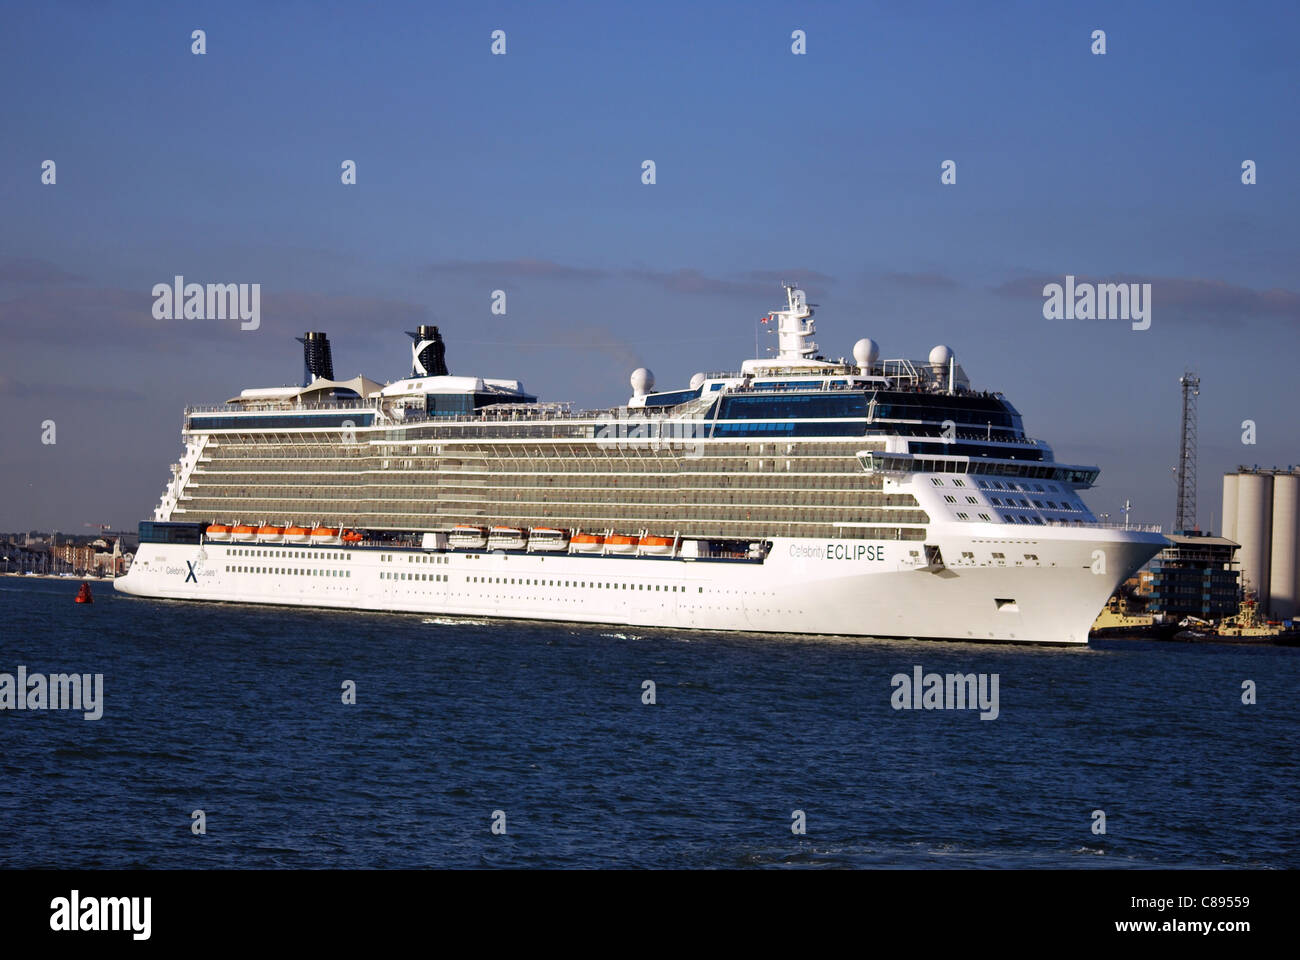 Southampton To Southampton | Celebrity Cruises 2020 | The ...